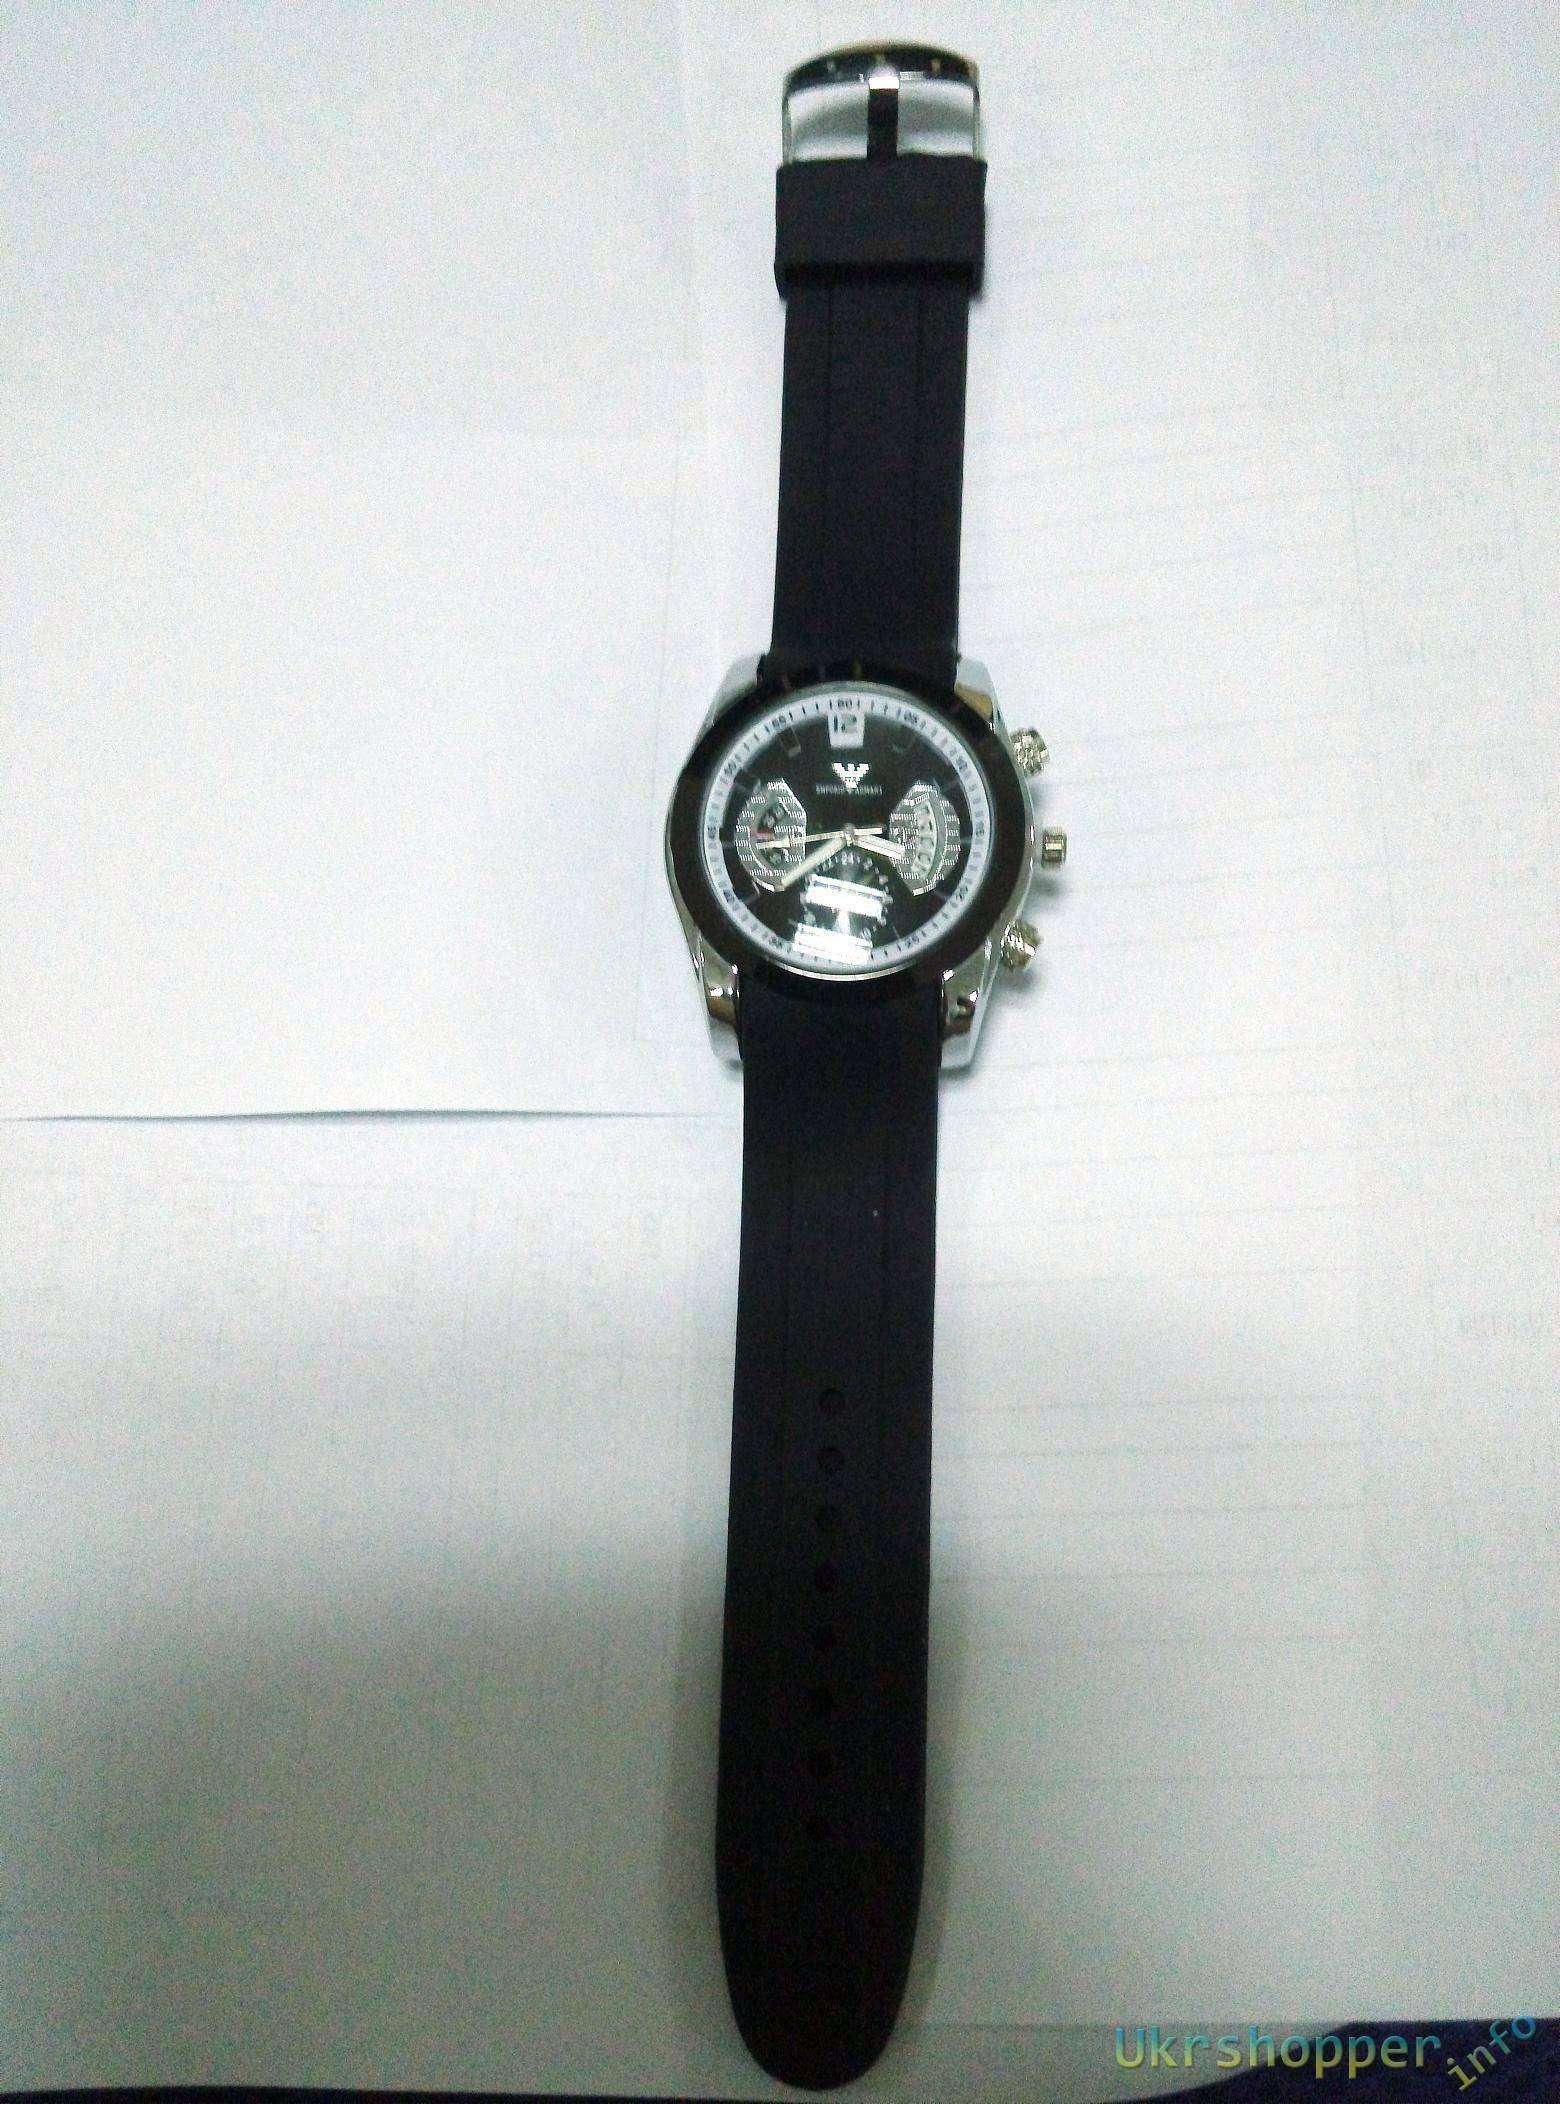 Popkind: Небольшой обзор дешевой реплки мужских часов Giorgio Armani watch